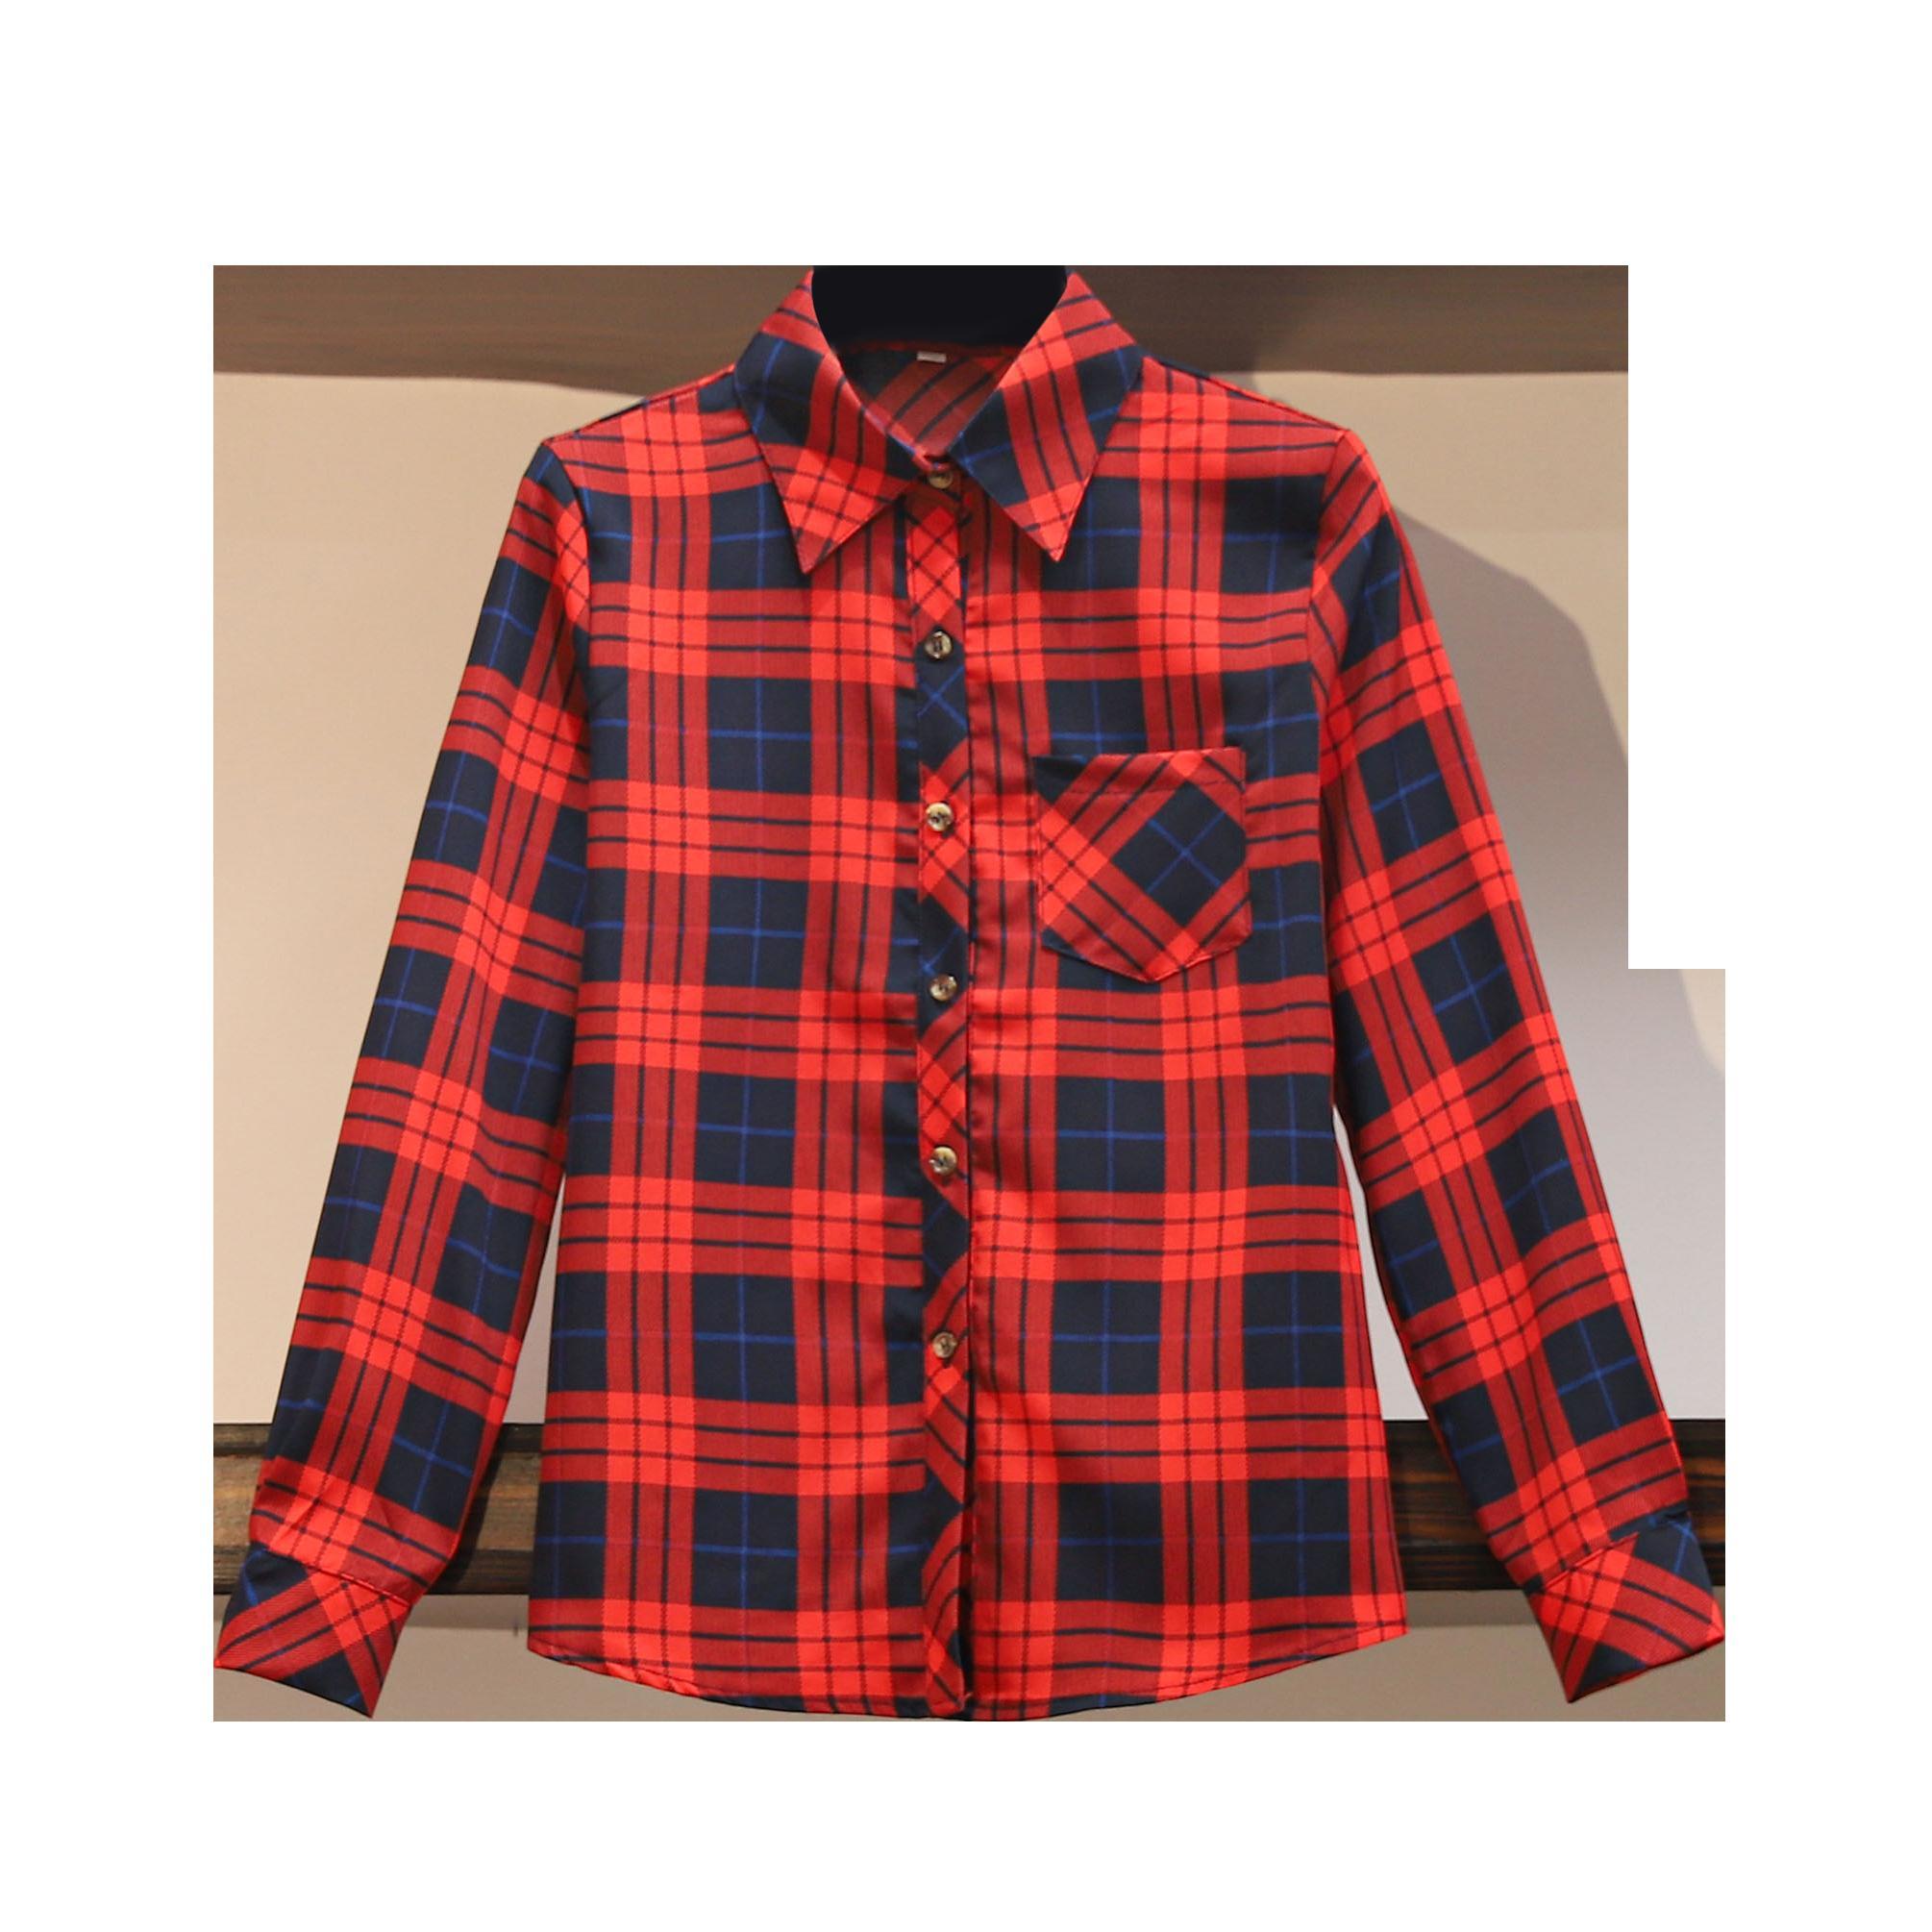 2020 new womens clothing spring summer fashion plaid print long sleeves shirt turn-down collar blouses female